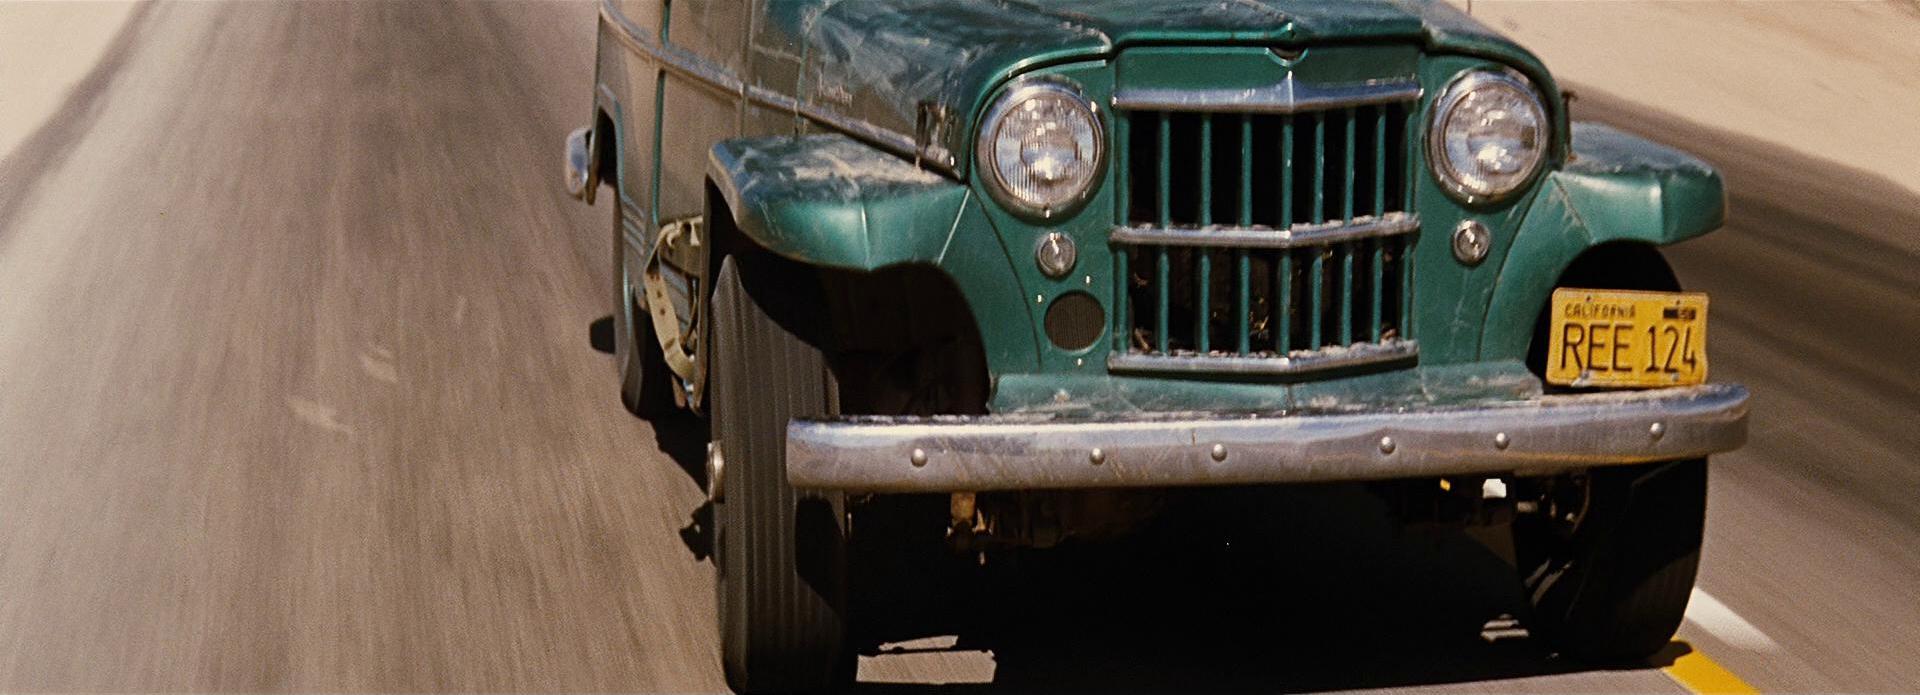 1950 To 1955 Jeep Wagon